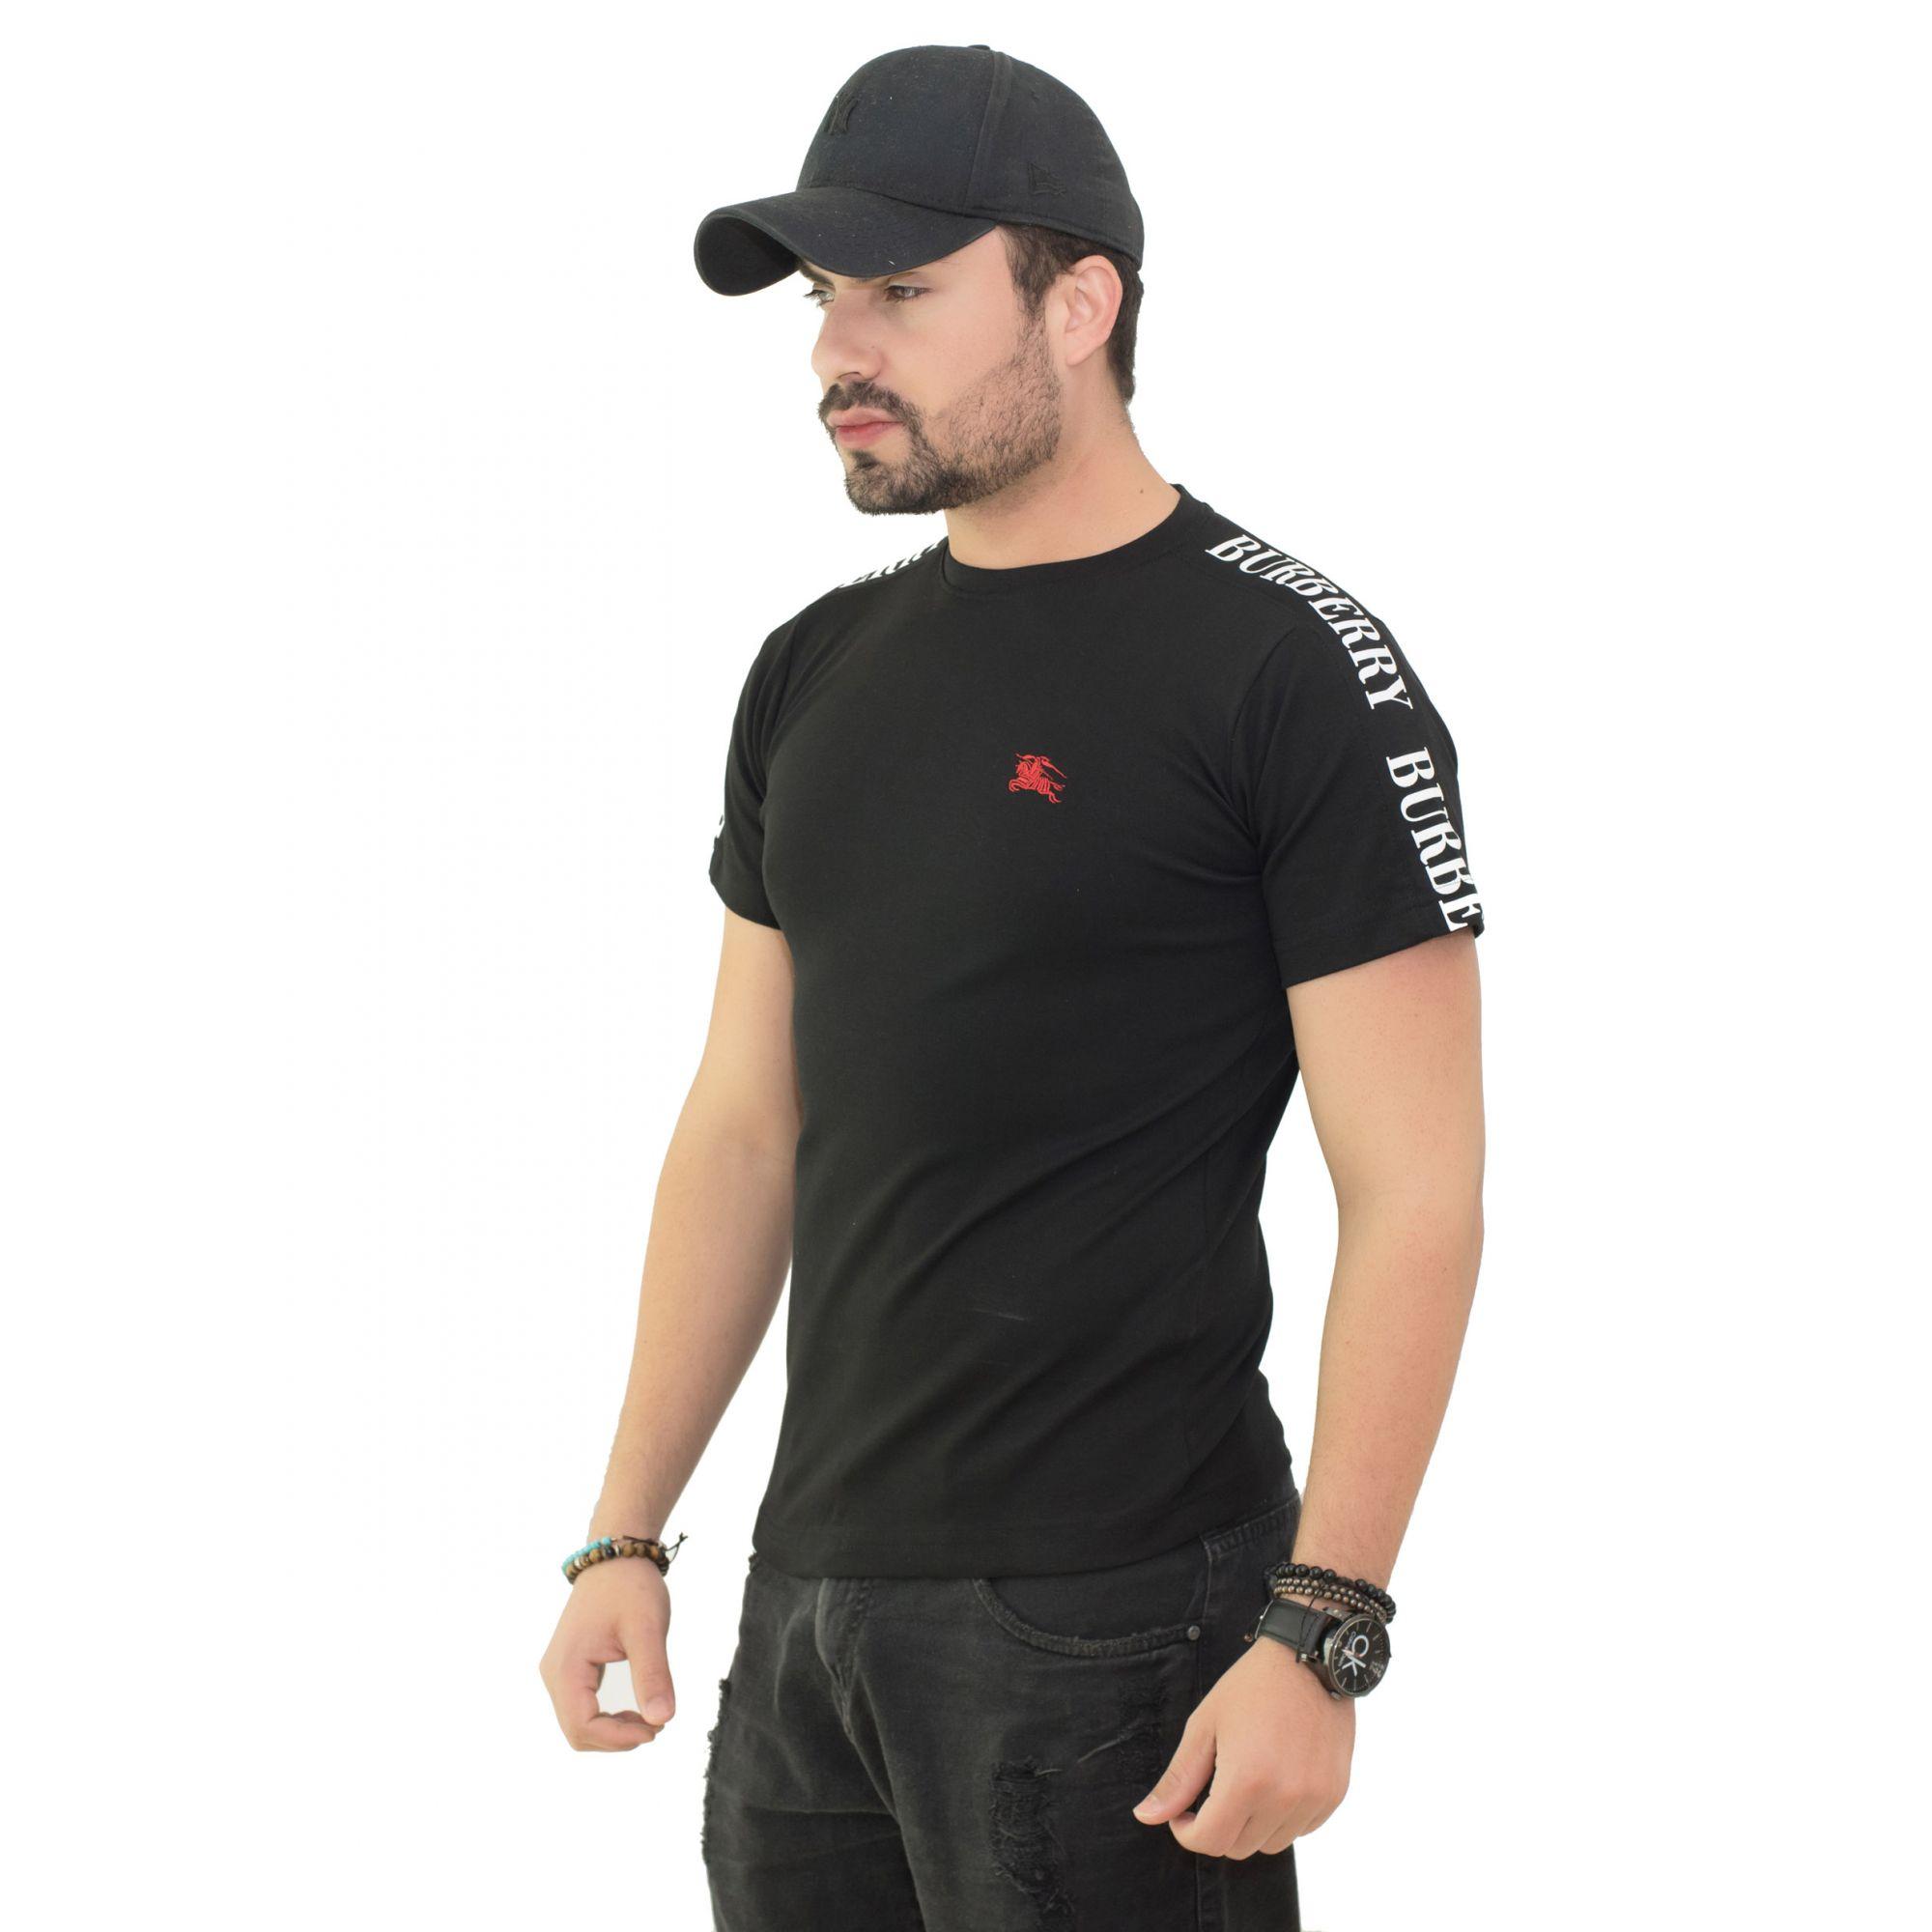 Camiseta Brb-03 Preta SLIM FIT  - Ca Brasileira